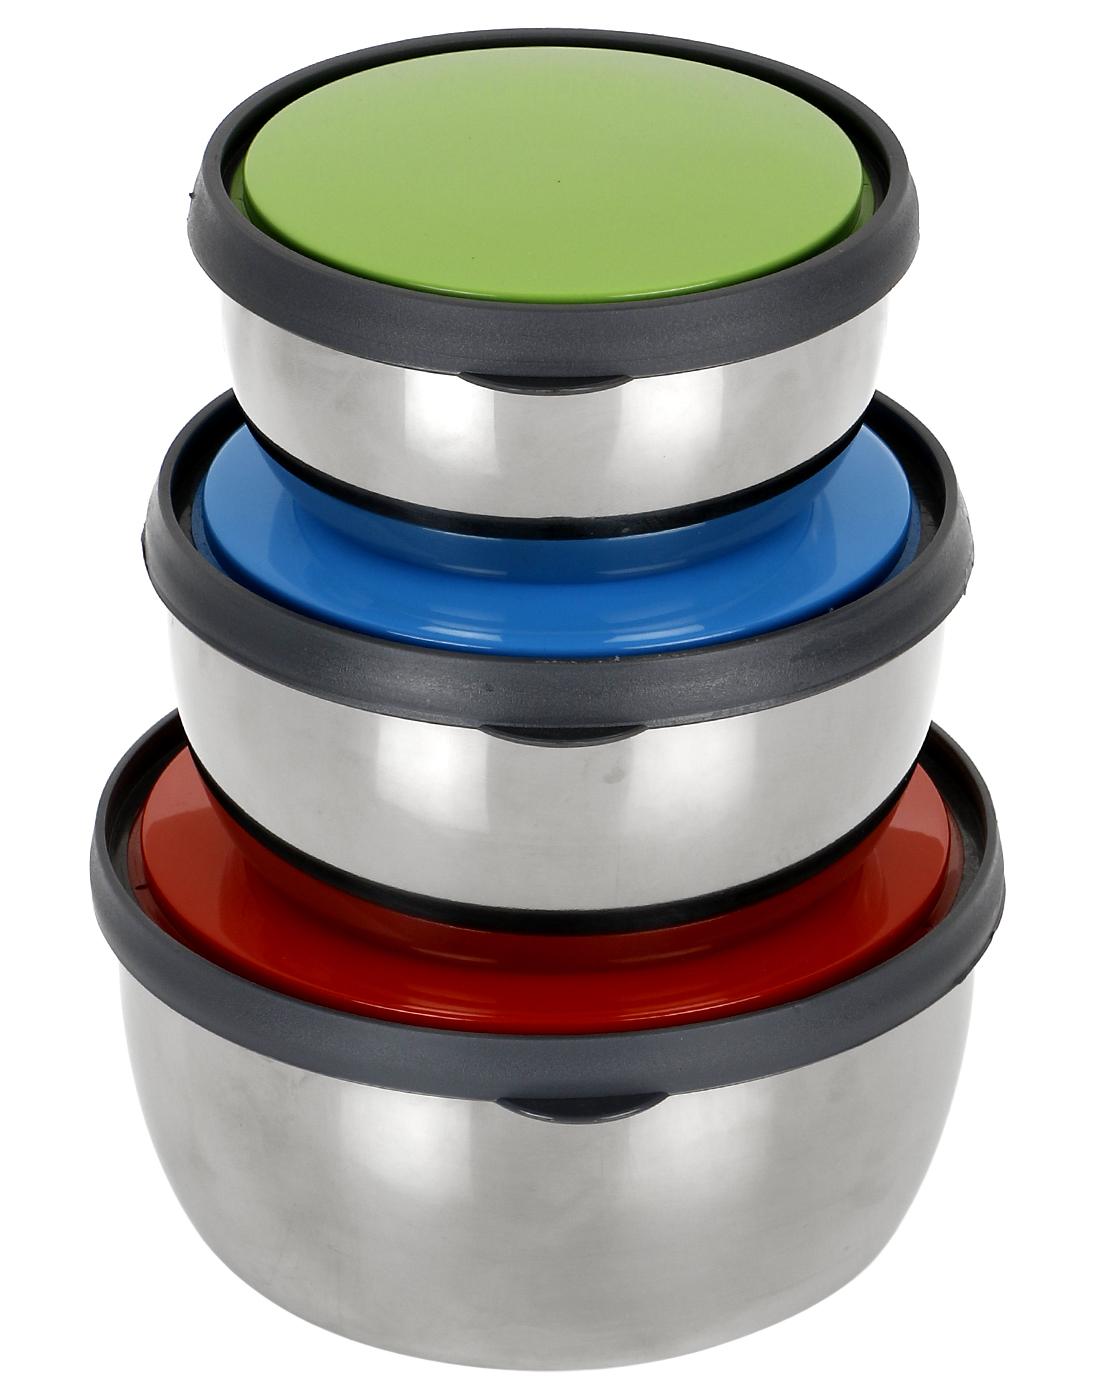 steel bowls   3 pc Set   lovato